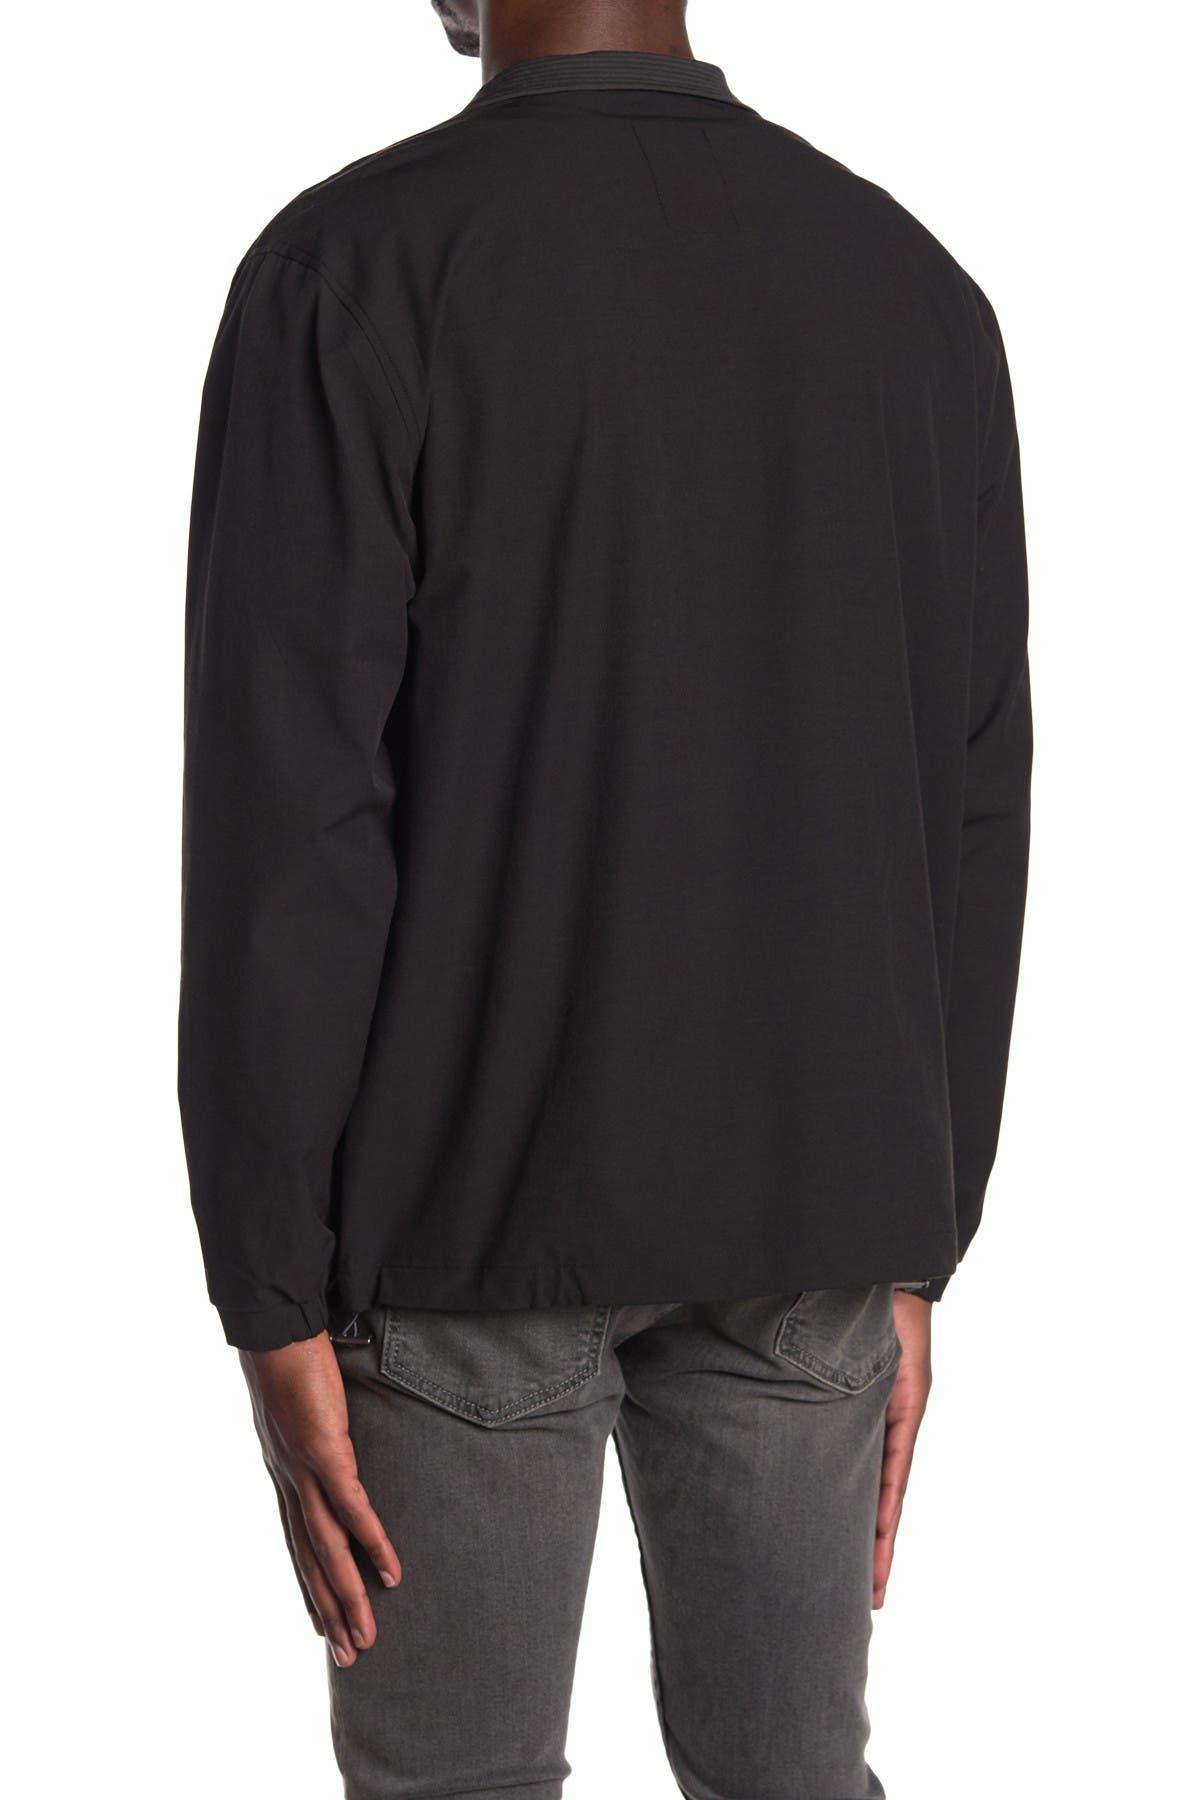 Image of LINKSOUL Funnel Collar Zip Jacket